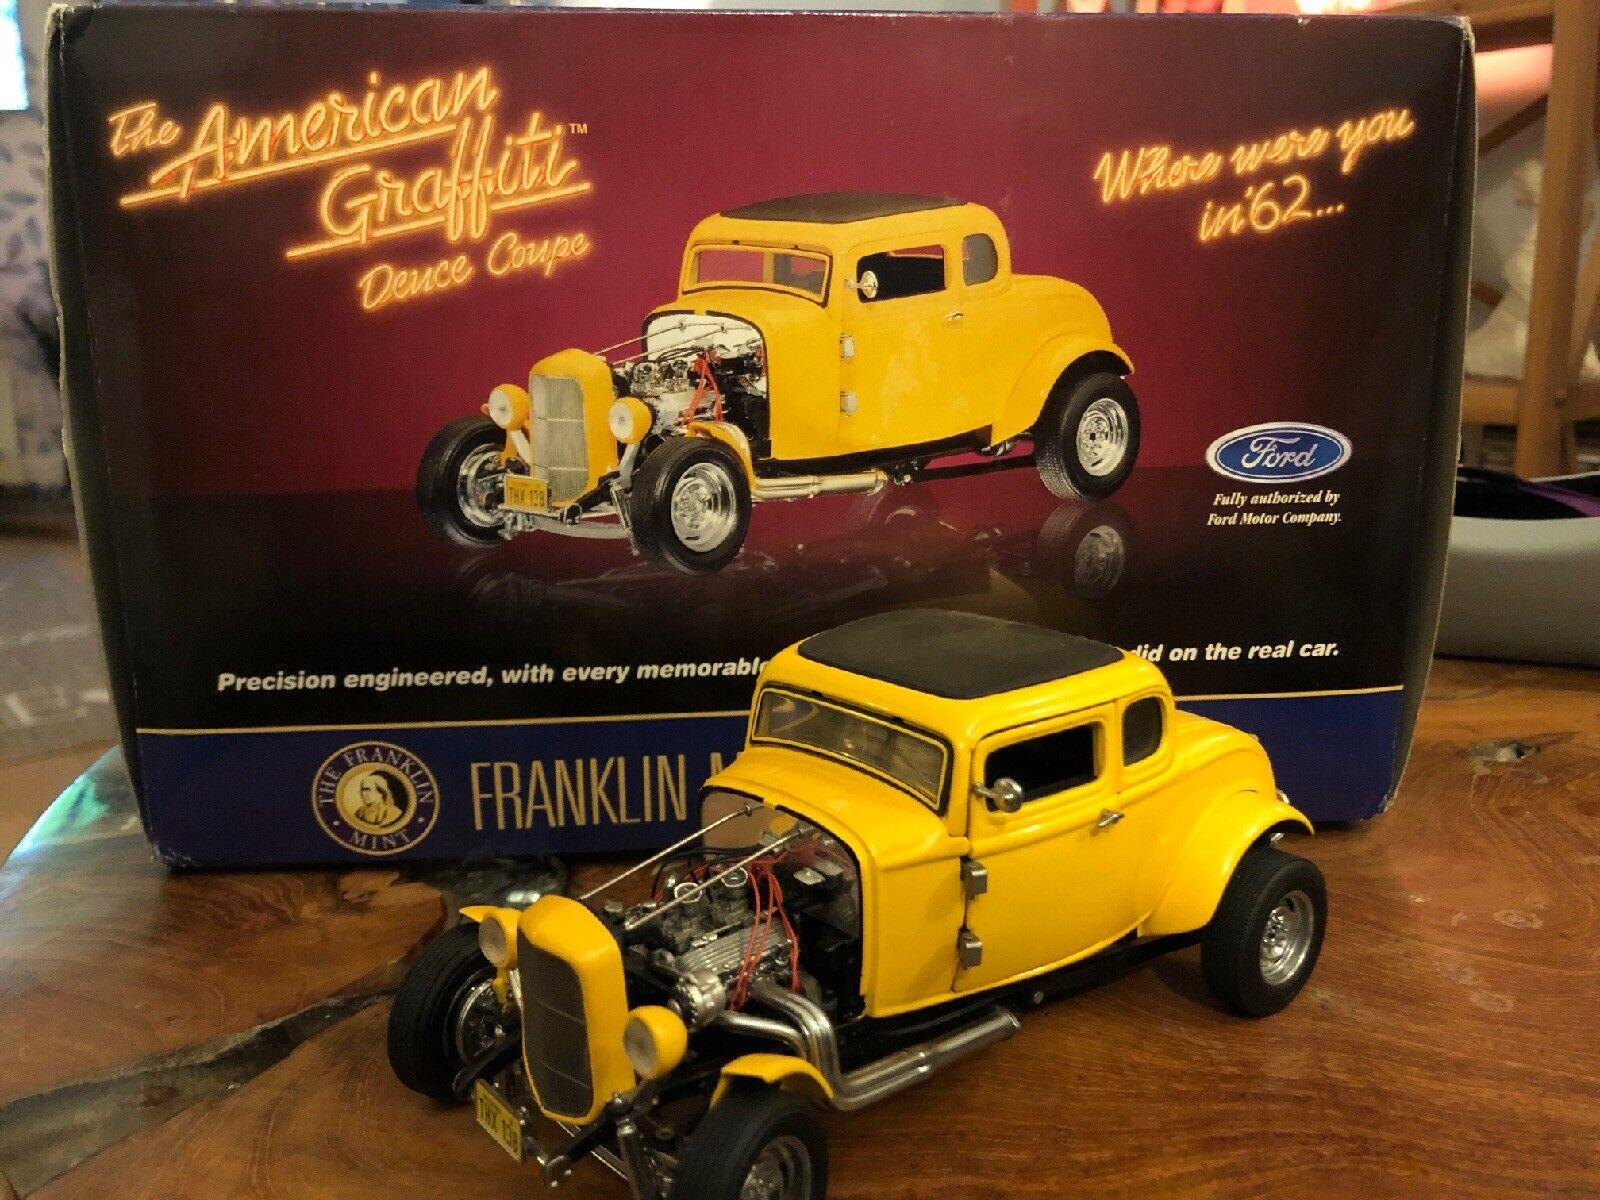 Danbury Franklin Mint American Graffiti 32 Ford 5 Window Deuce Coupe Hot Rod